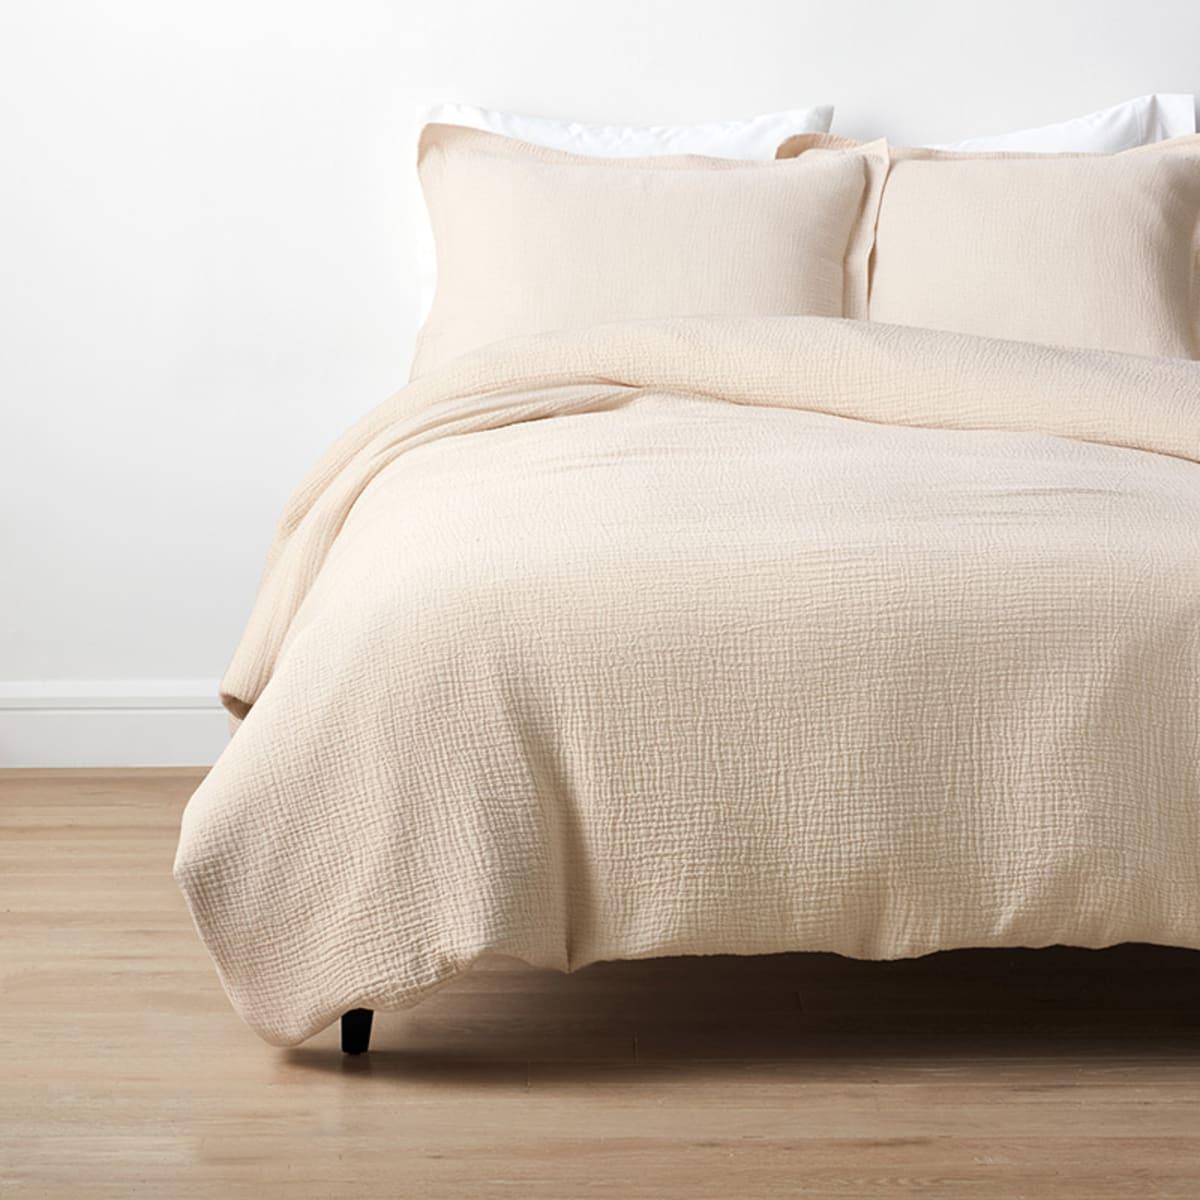 Weaver Organic Cotton Reversible Duvet Cover